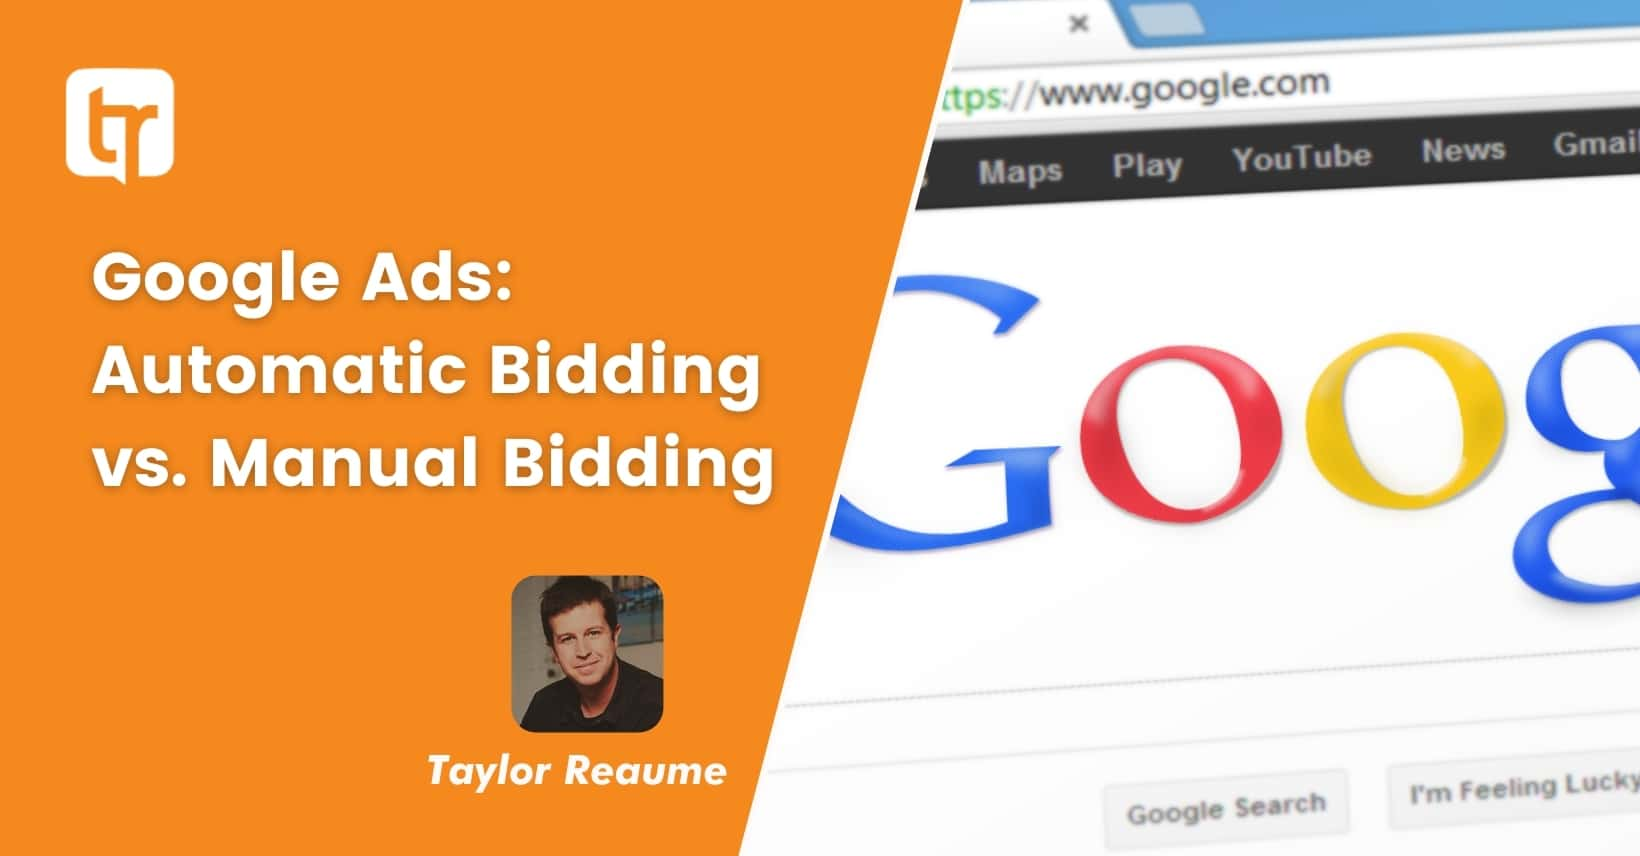 Google Ads: Automatic Bidding vs. Manual Bidding